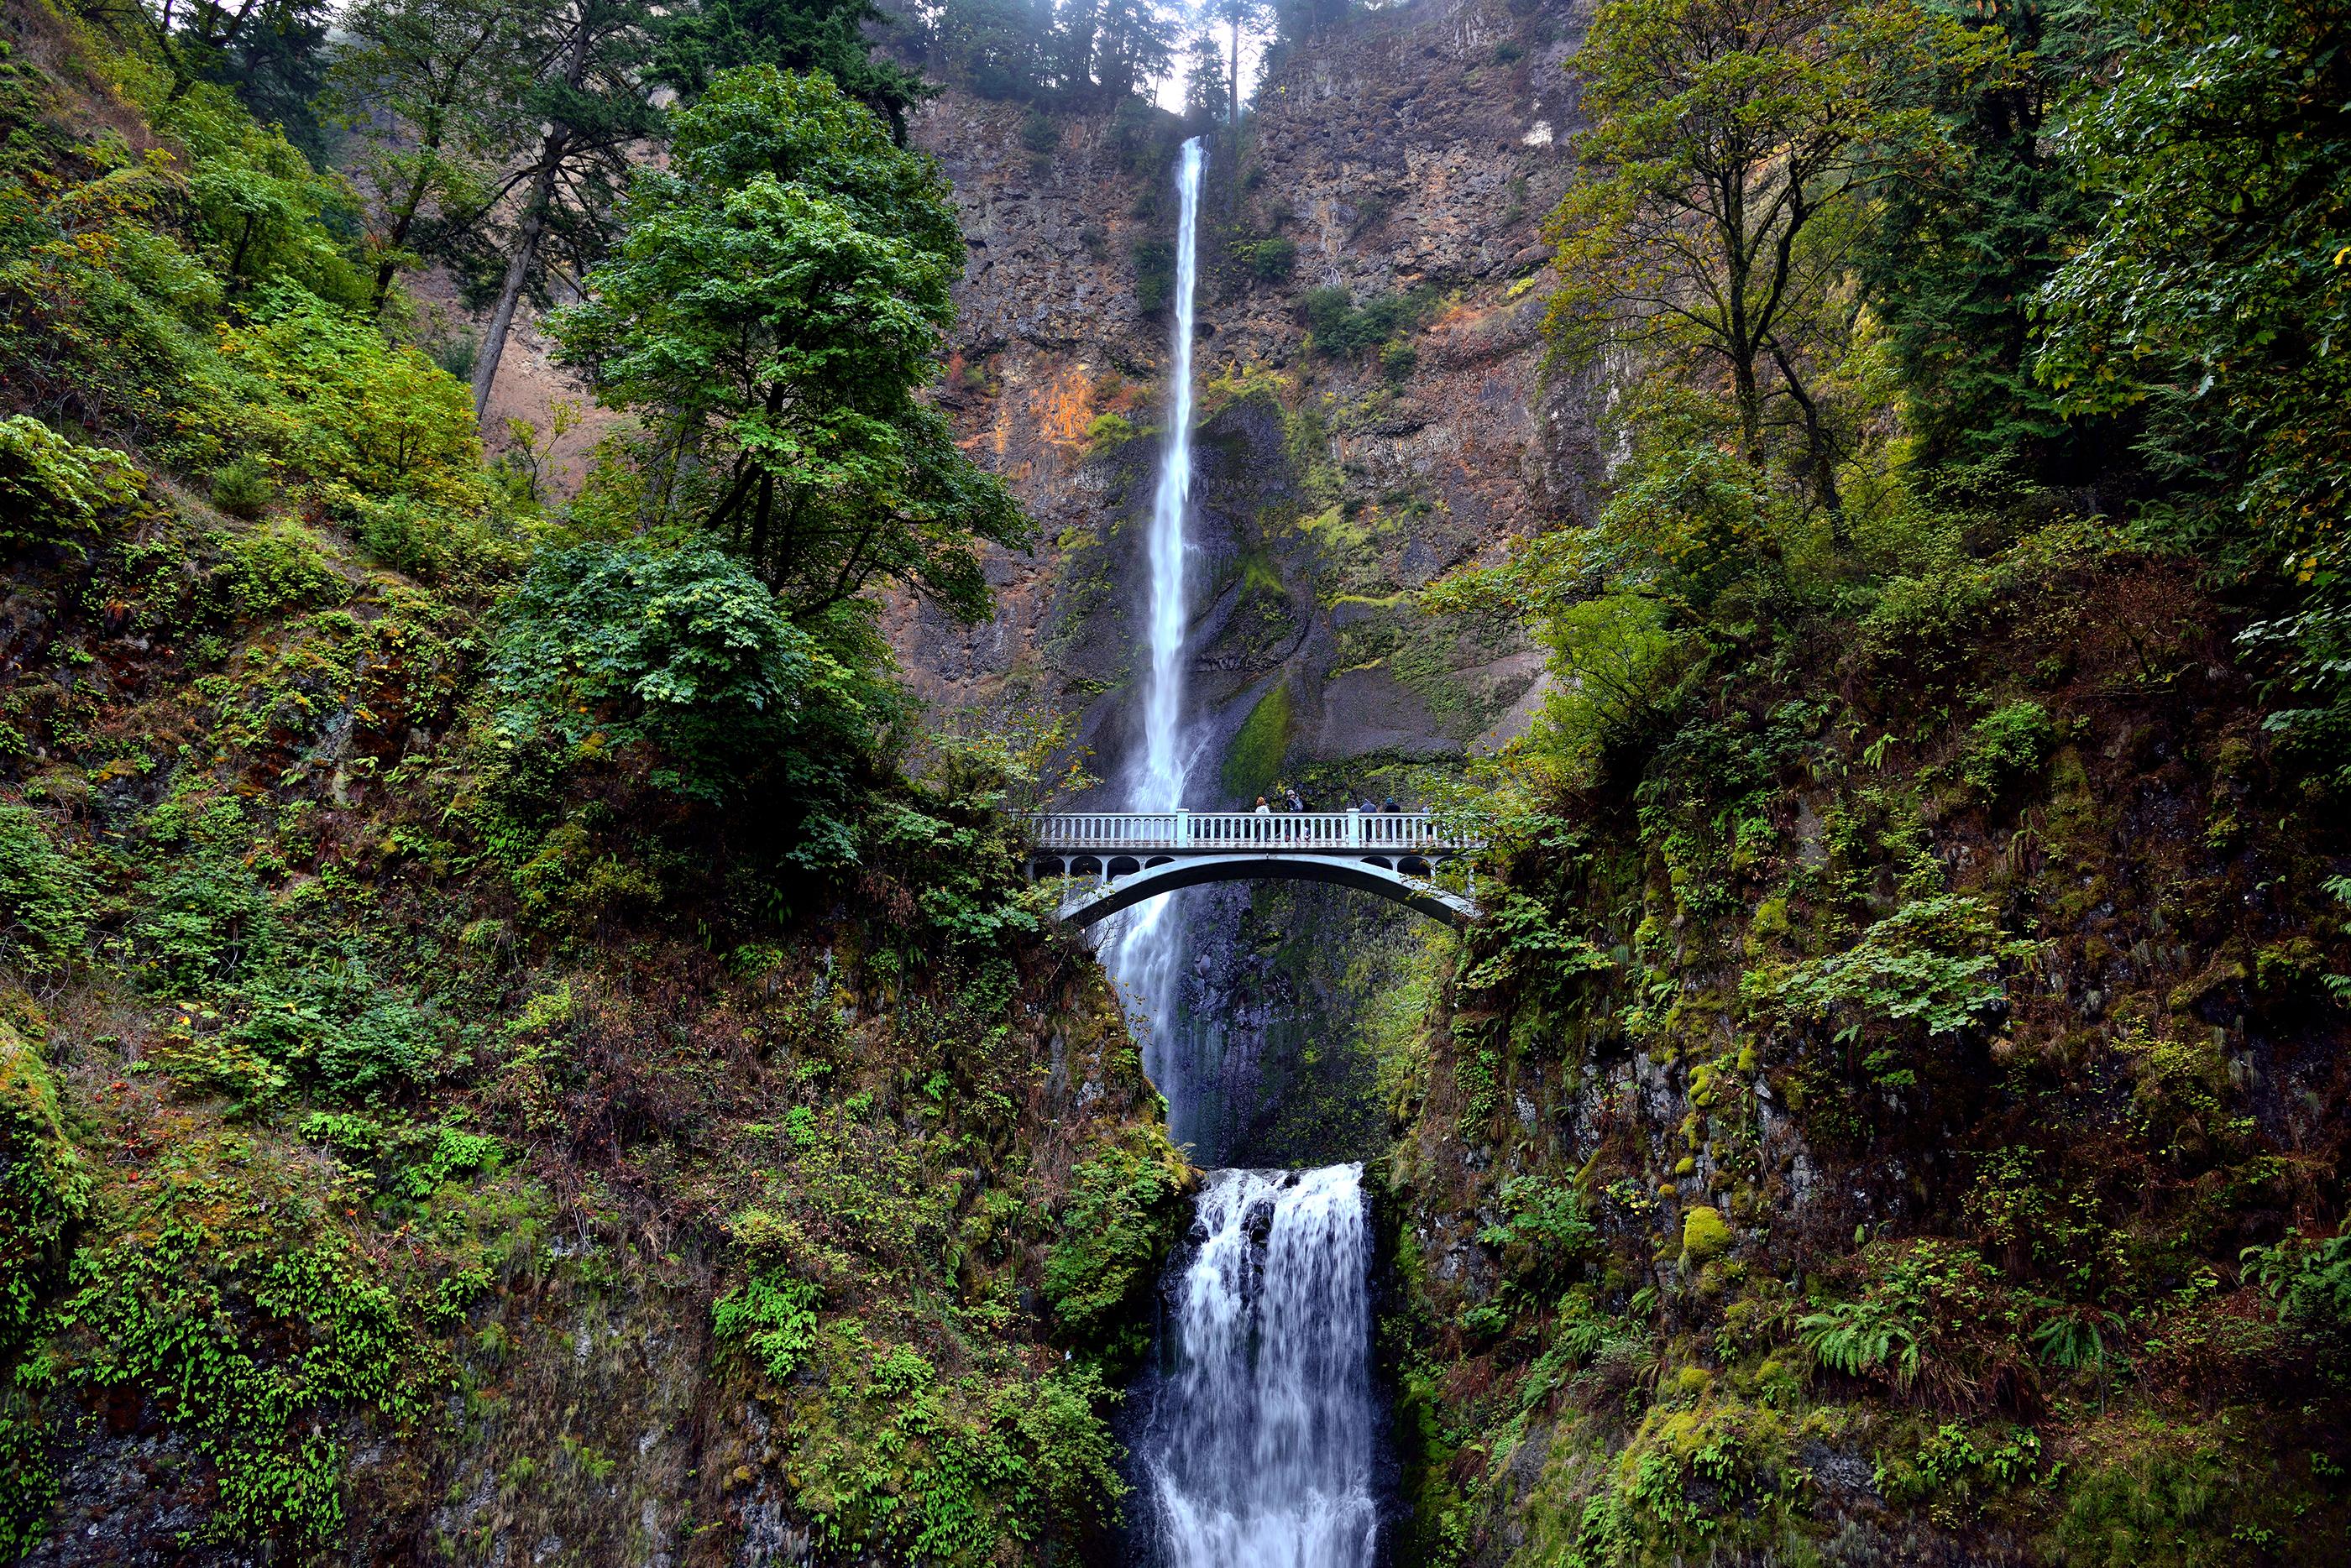 The Wonderful Beauty of Multnomah Falls